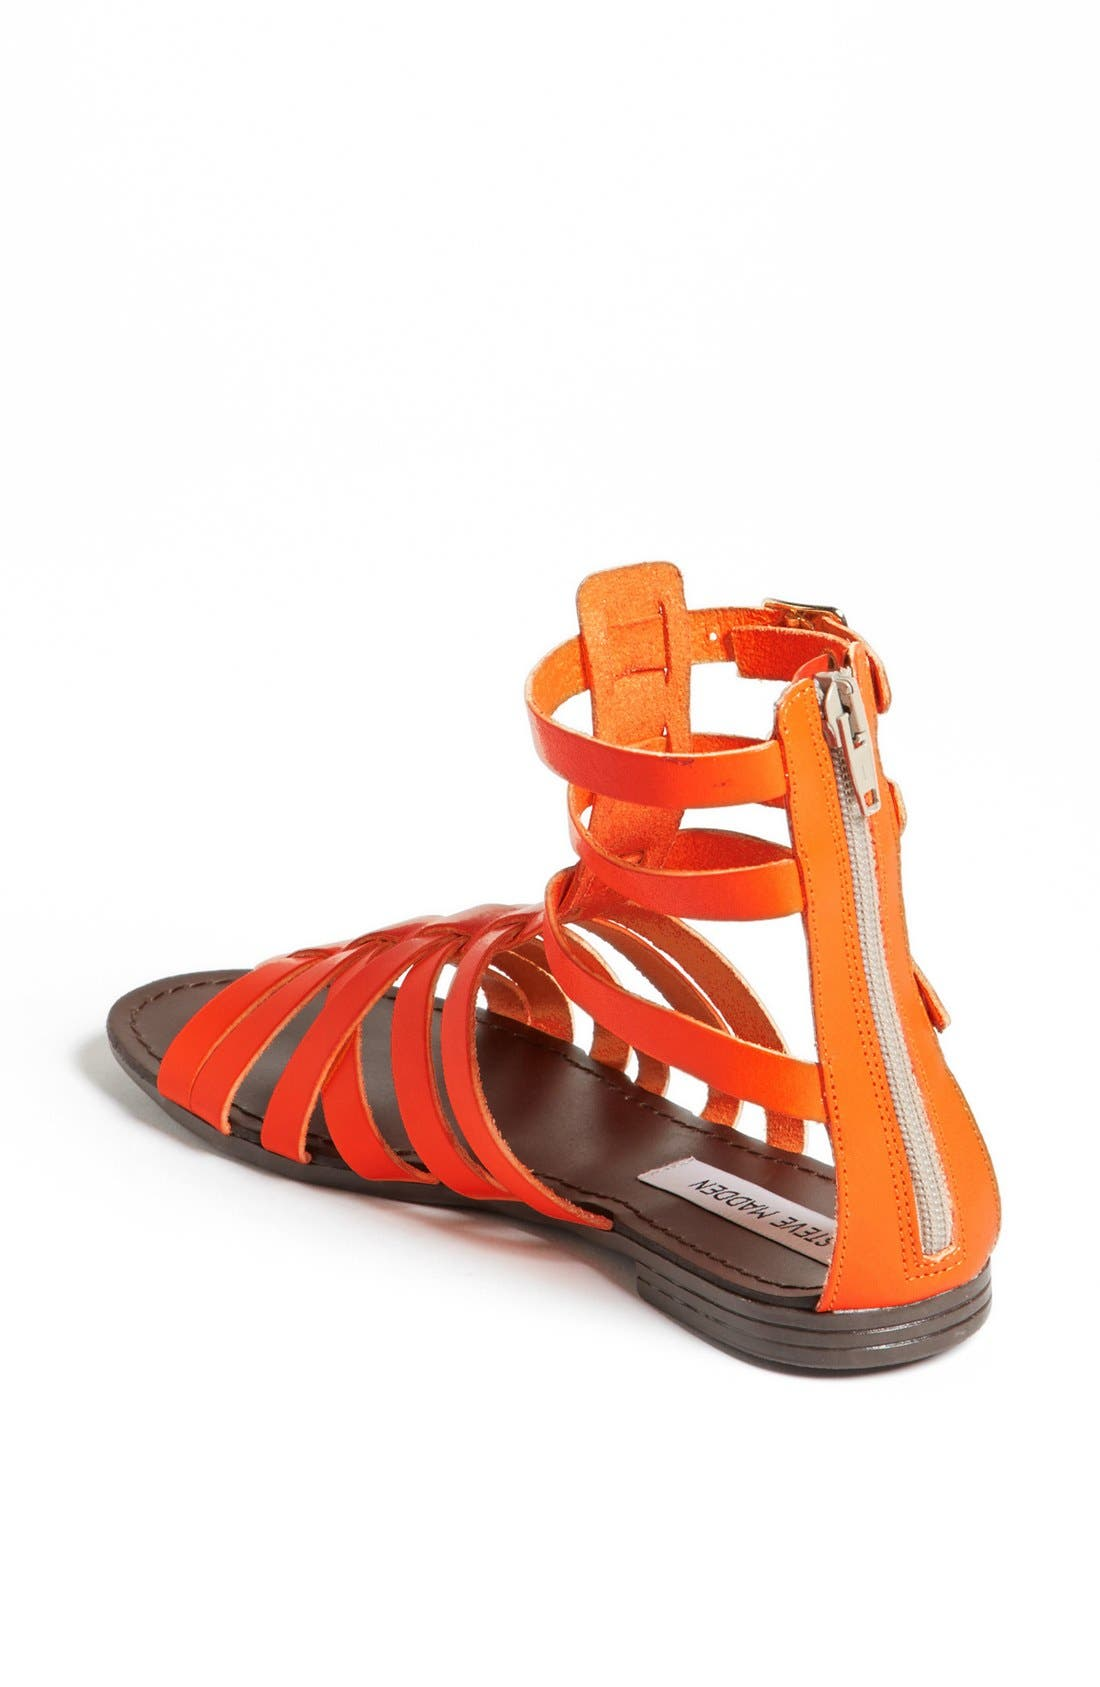 'Plato' Sandal,                             Alternate thumbnail 2, color,                             Orange